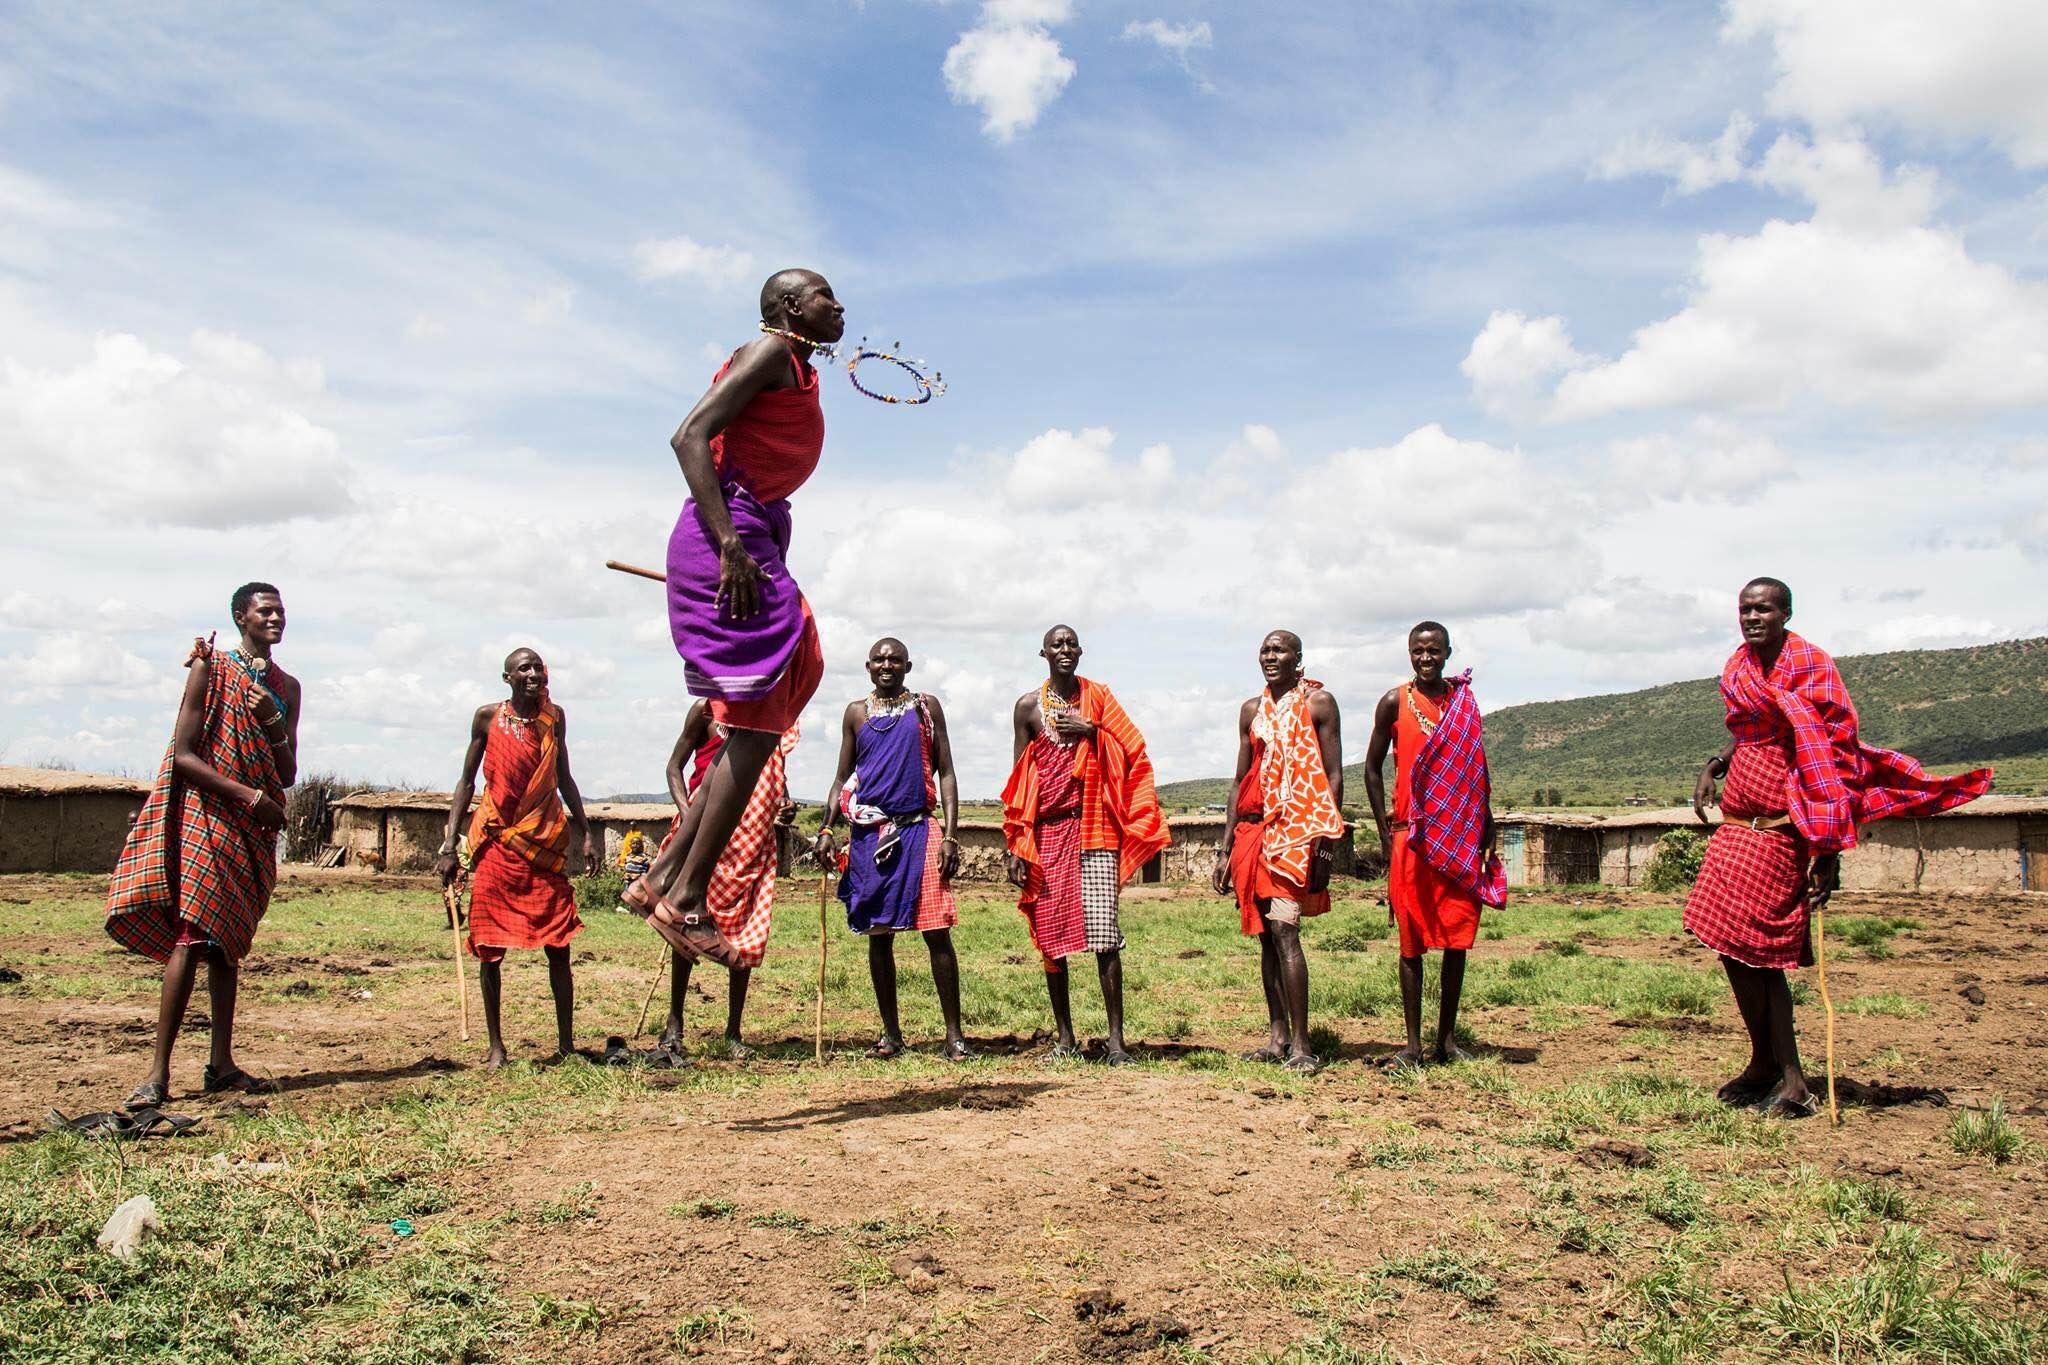 Masai people of Kenya, Jump ritual